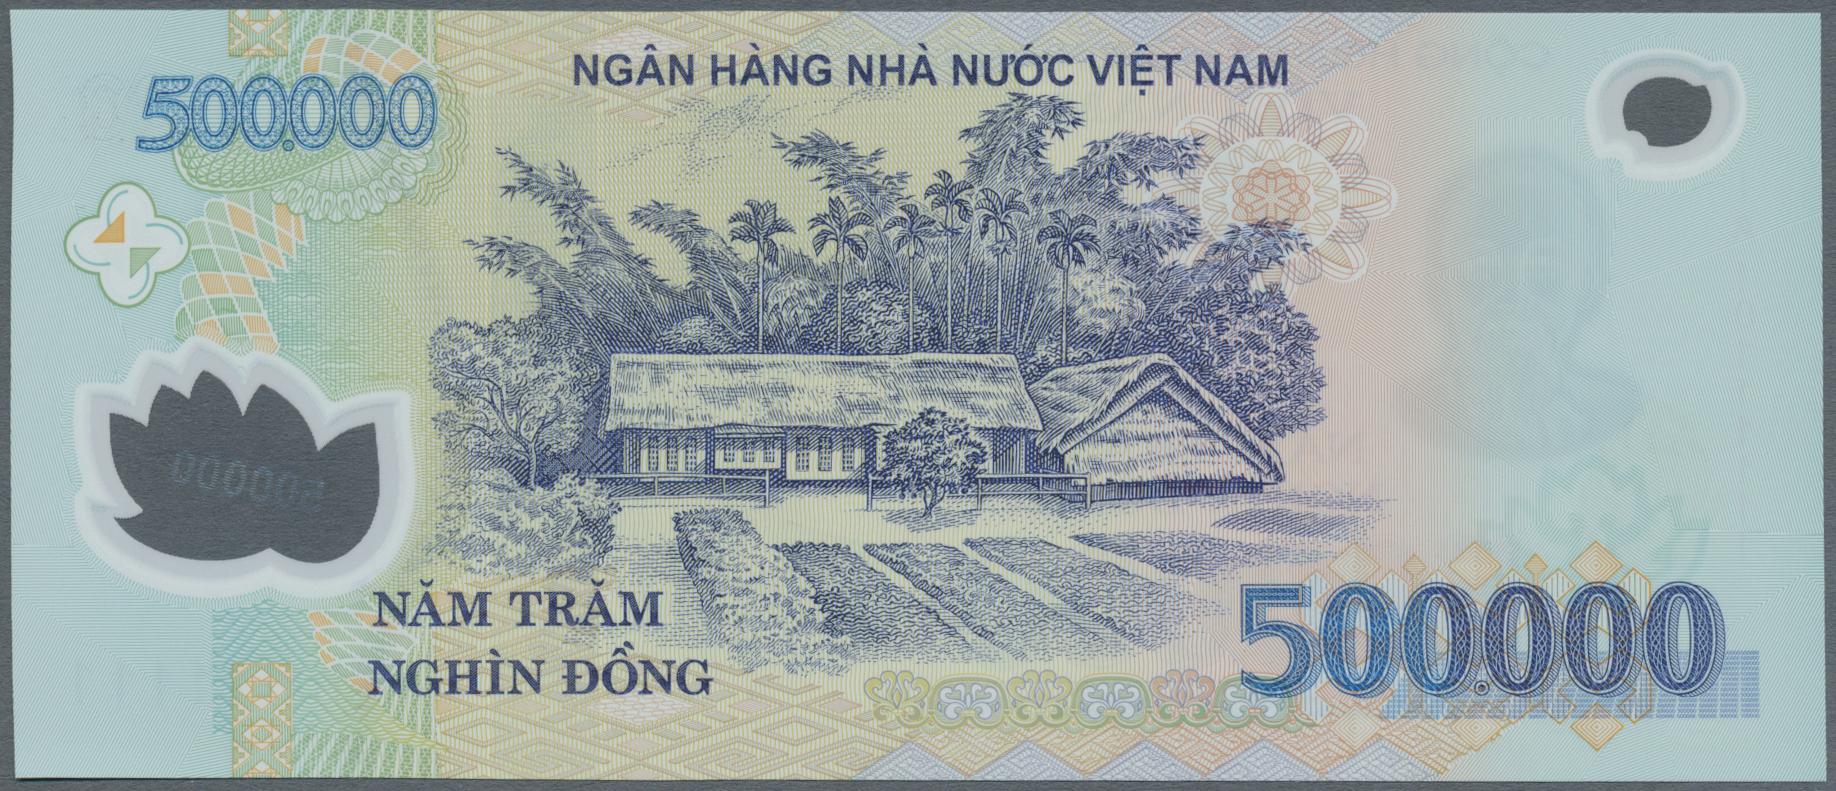 Lot 2251 - Vietnam | Banknoten  -  Auktionshaus Christoph Gärtner GmbH & Co. KG Banknotes & Coins Auction #39 Day 2